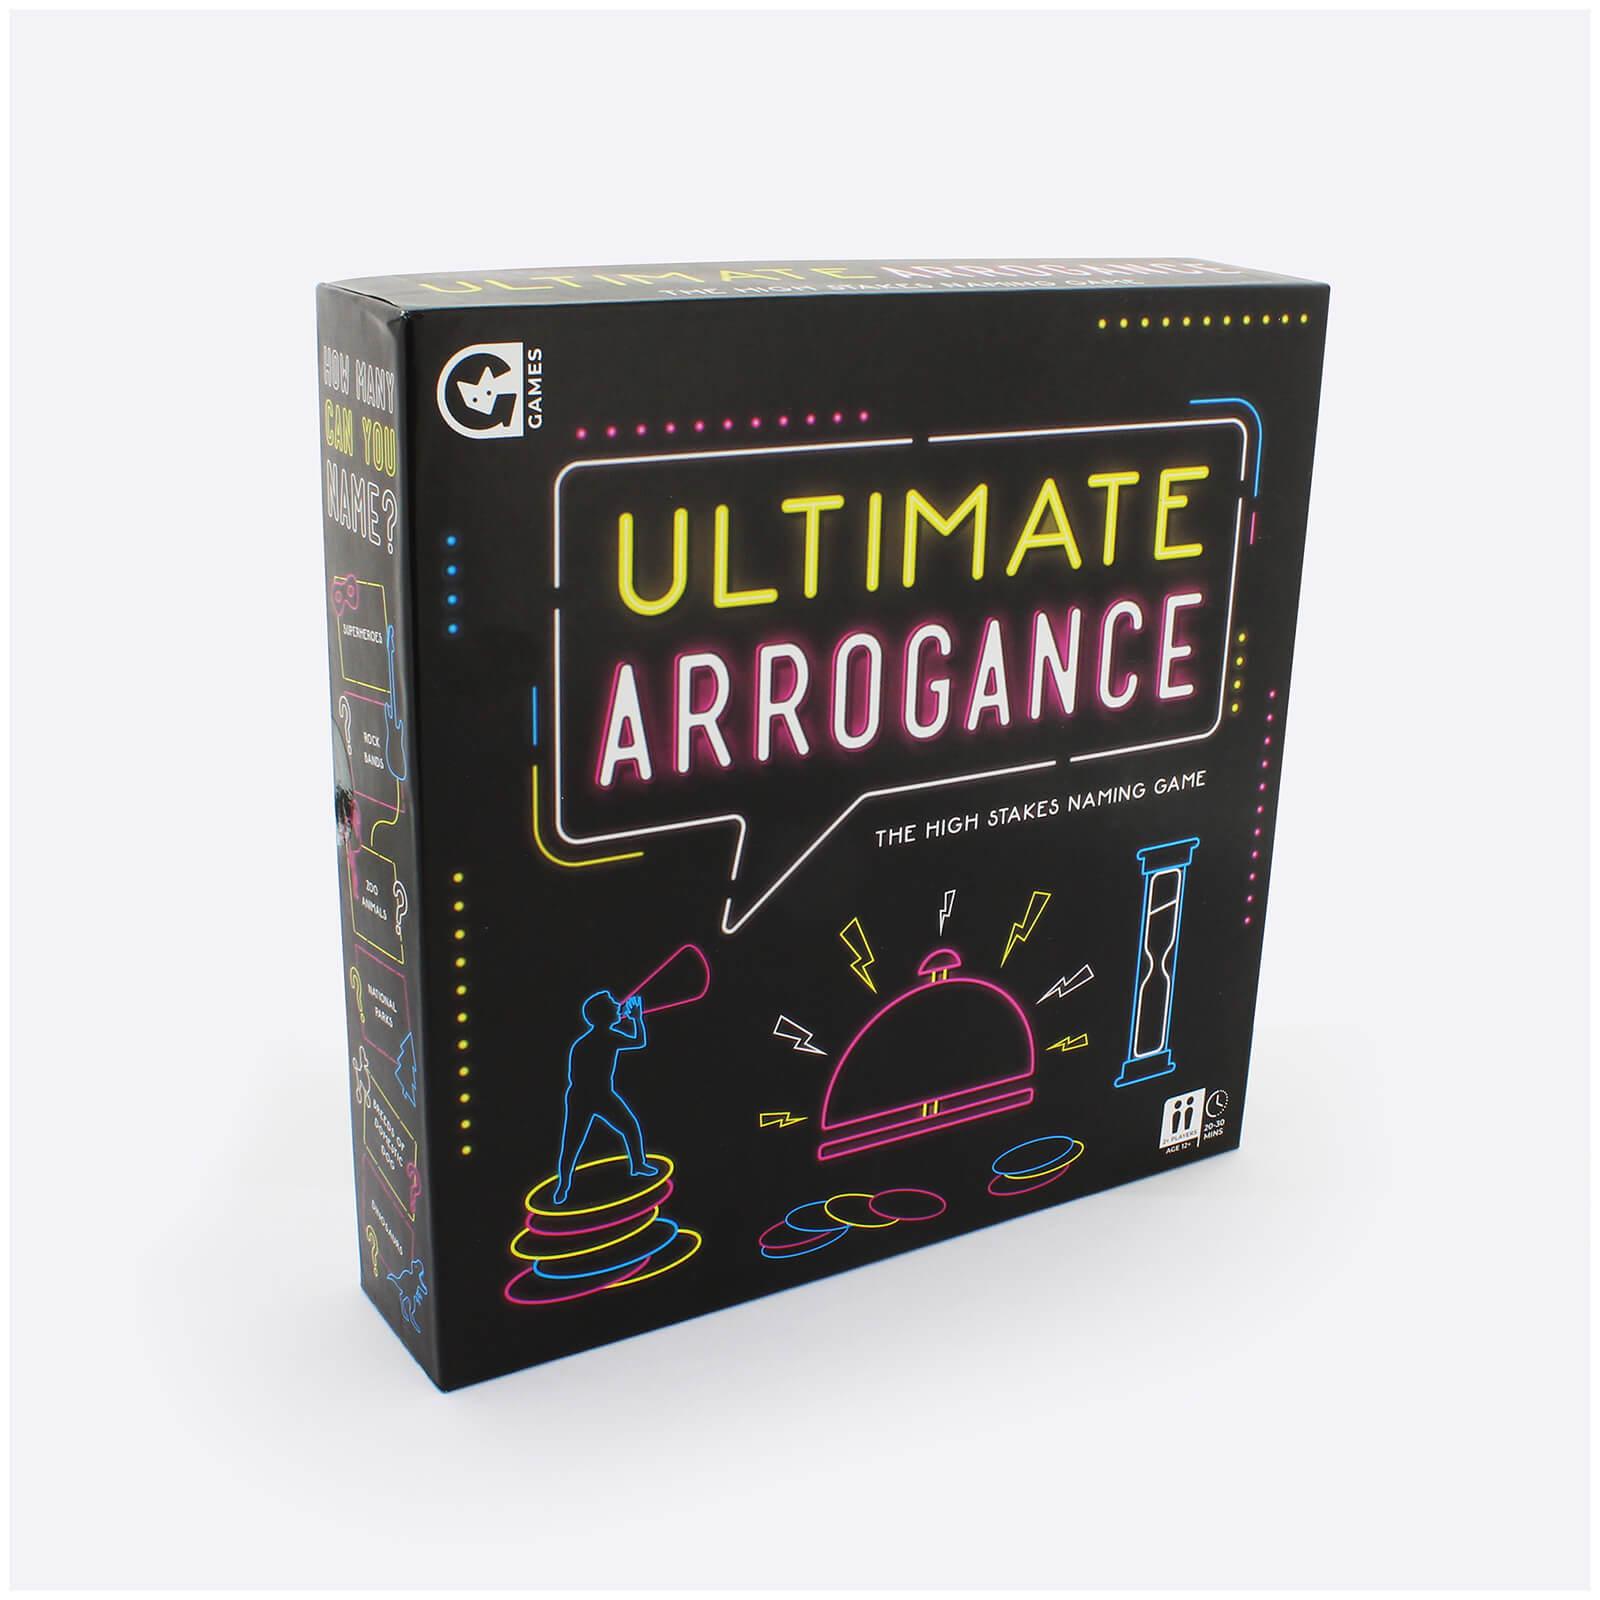 Image of Ultimate Arrogance Game